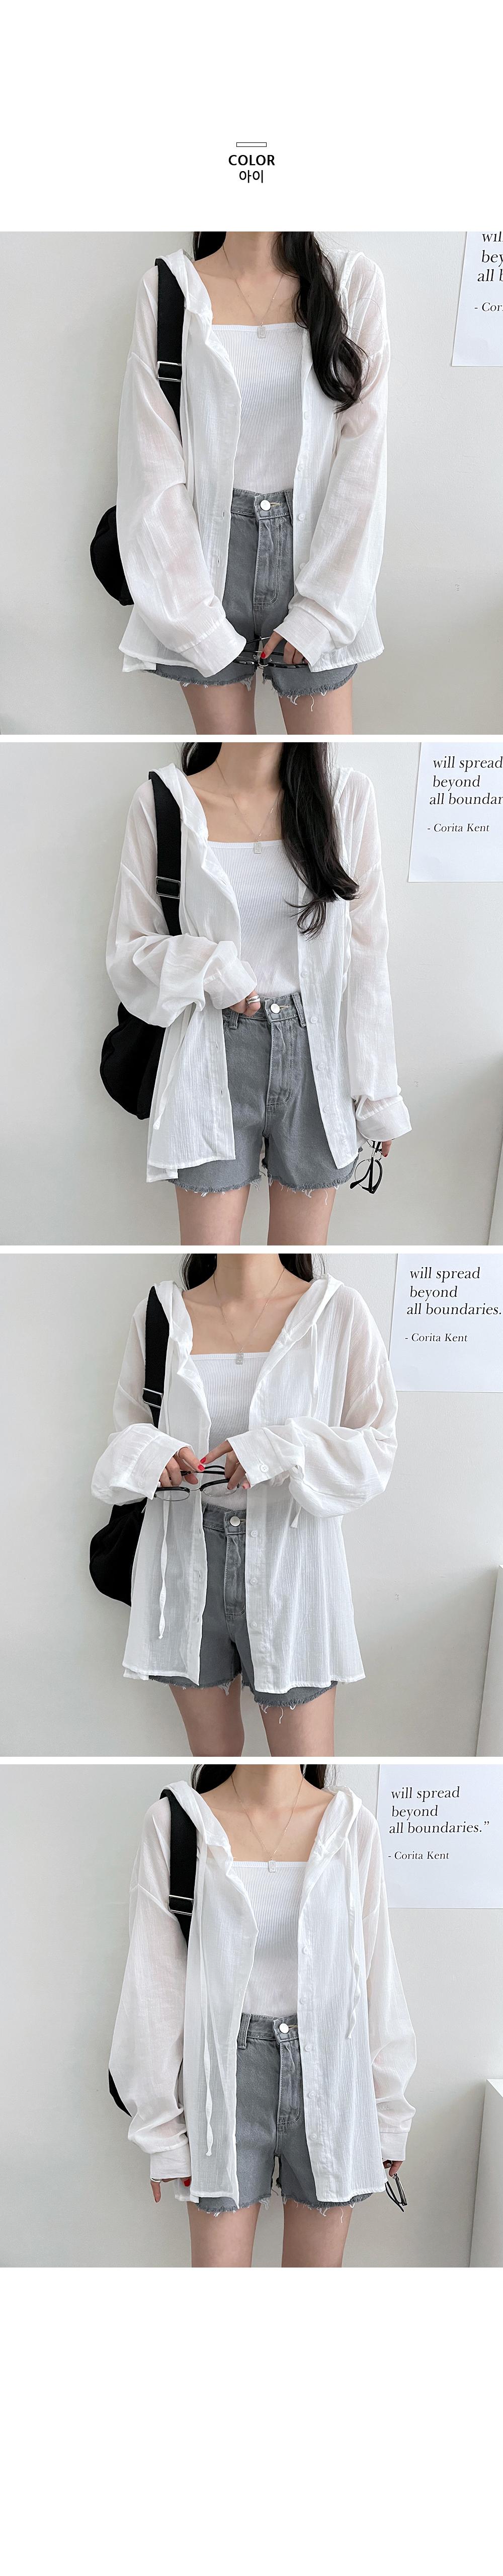 Camille see-through hooded shirt Shirt